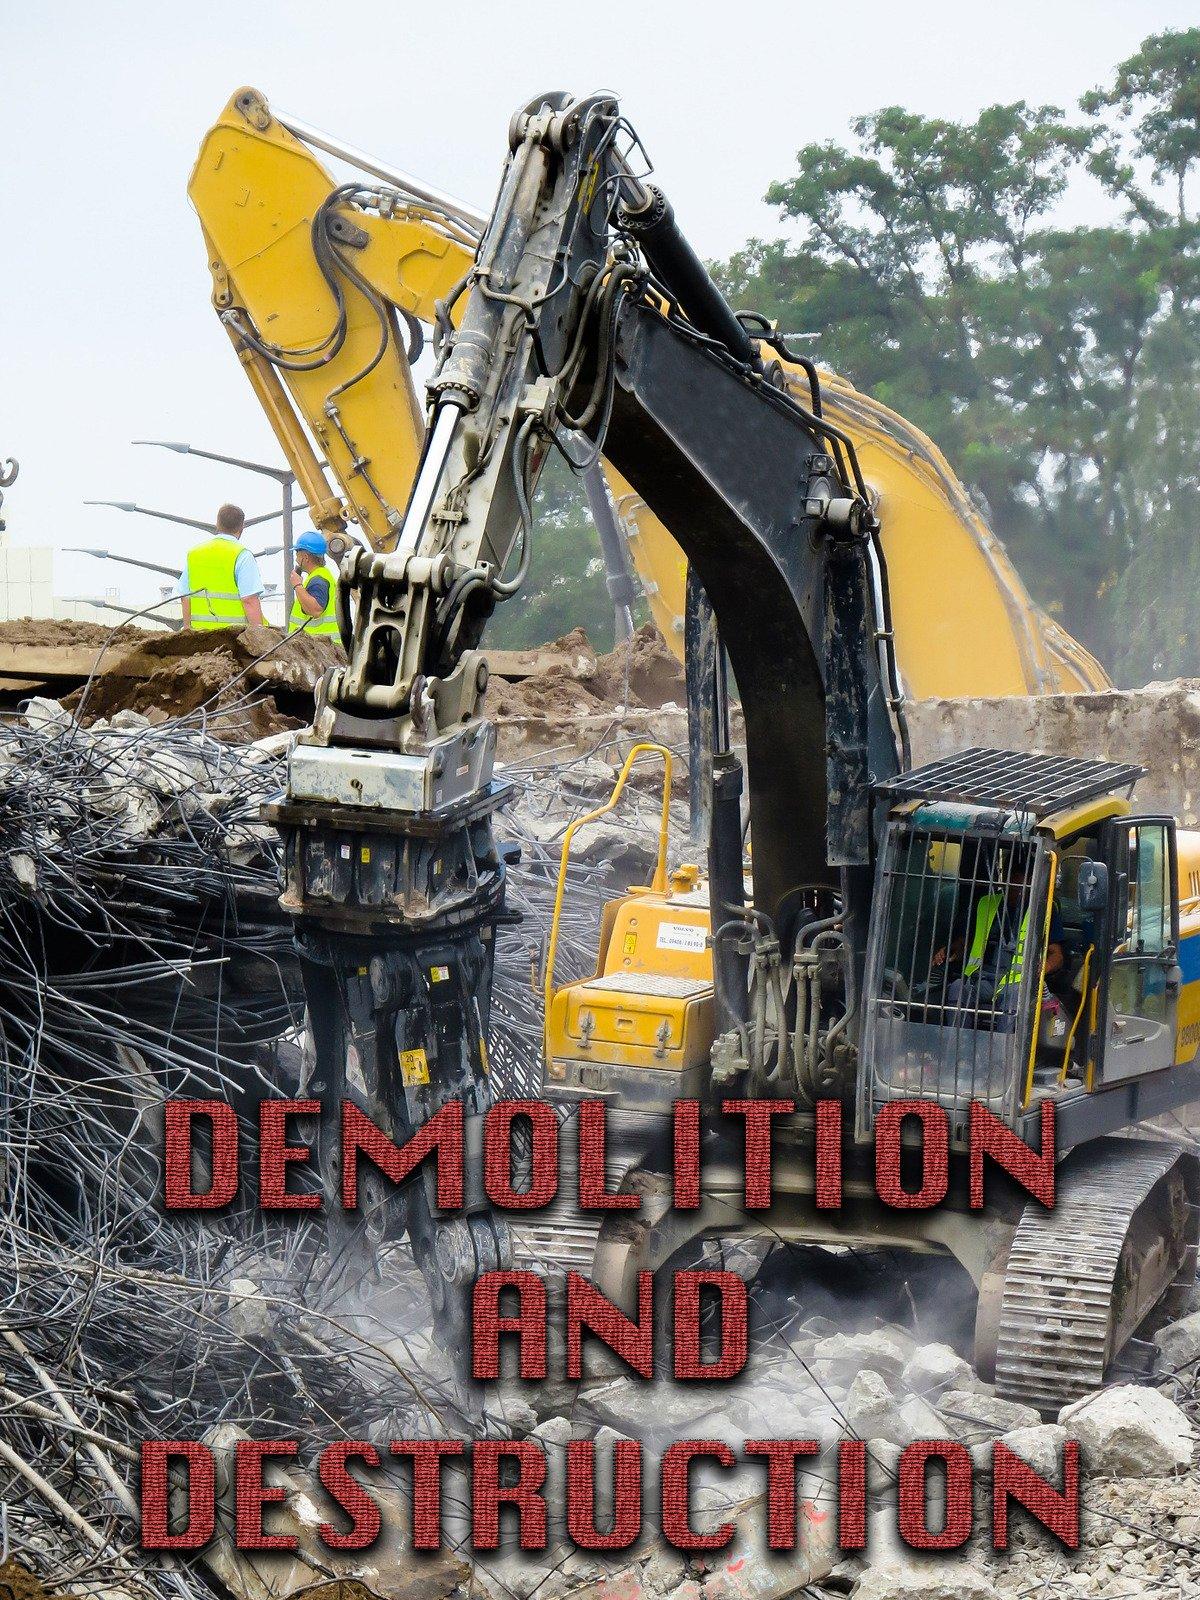 Demolition and Destruction